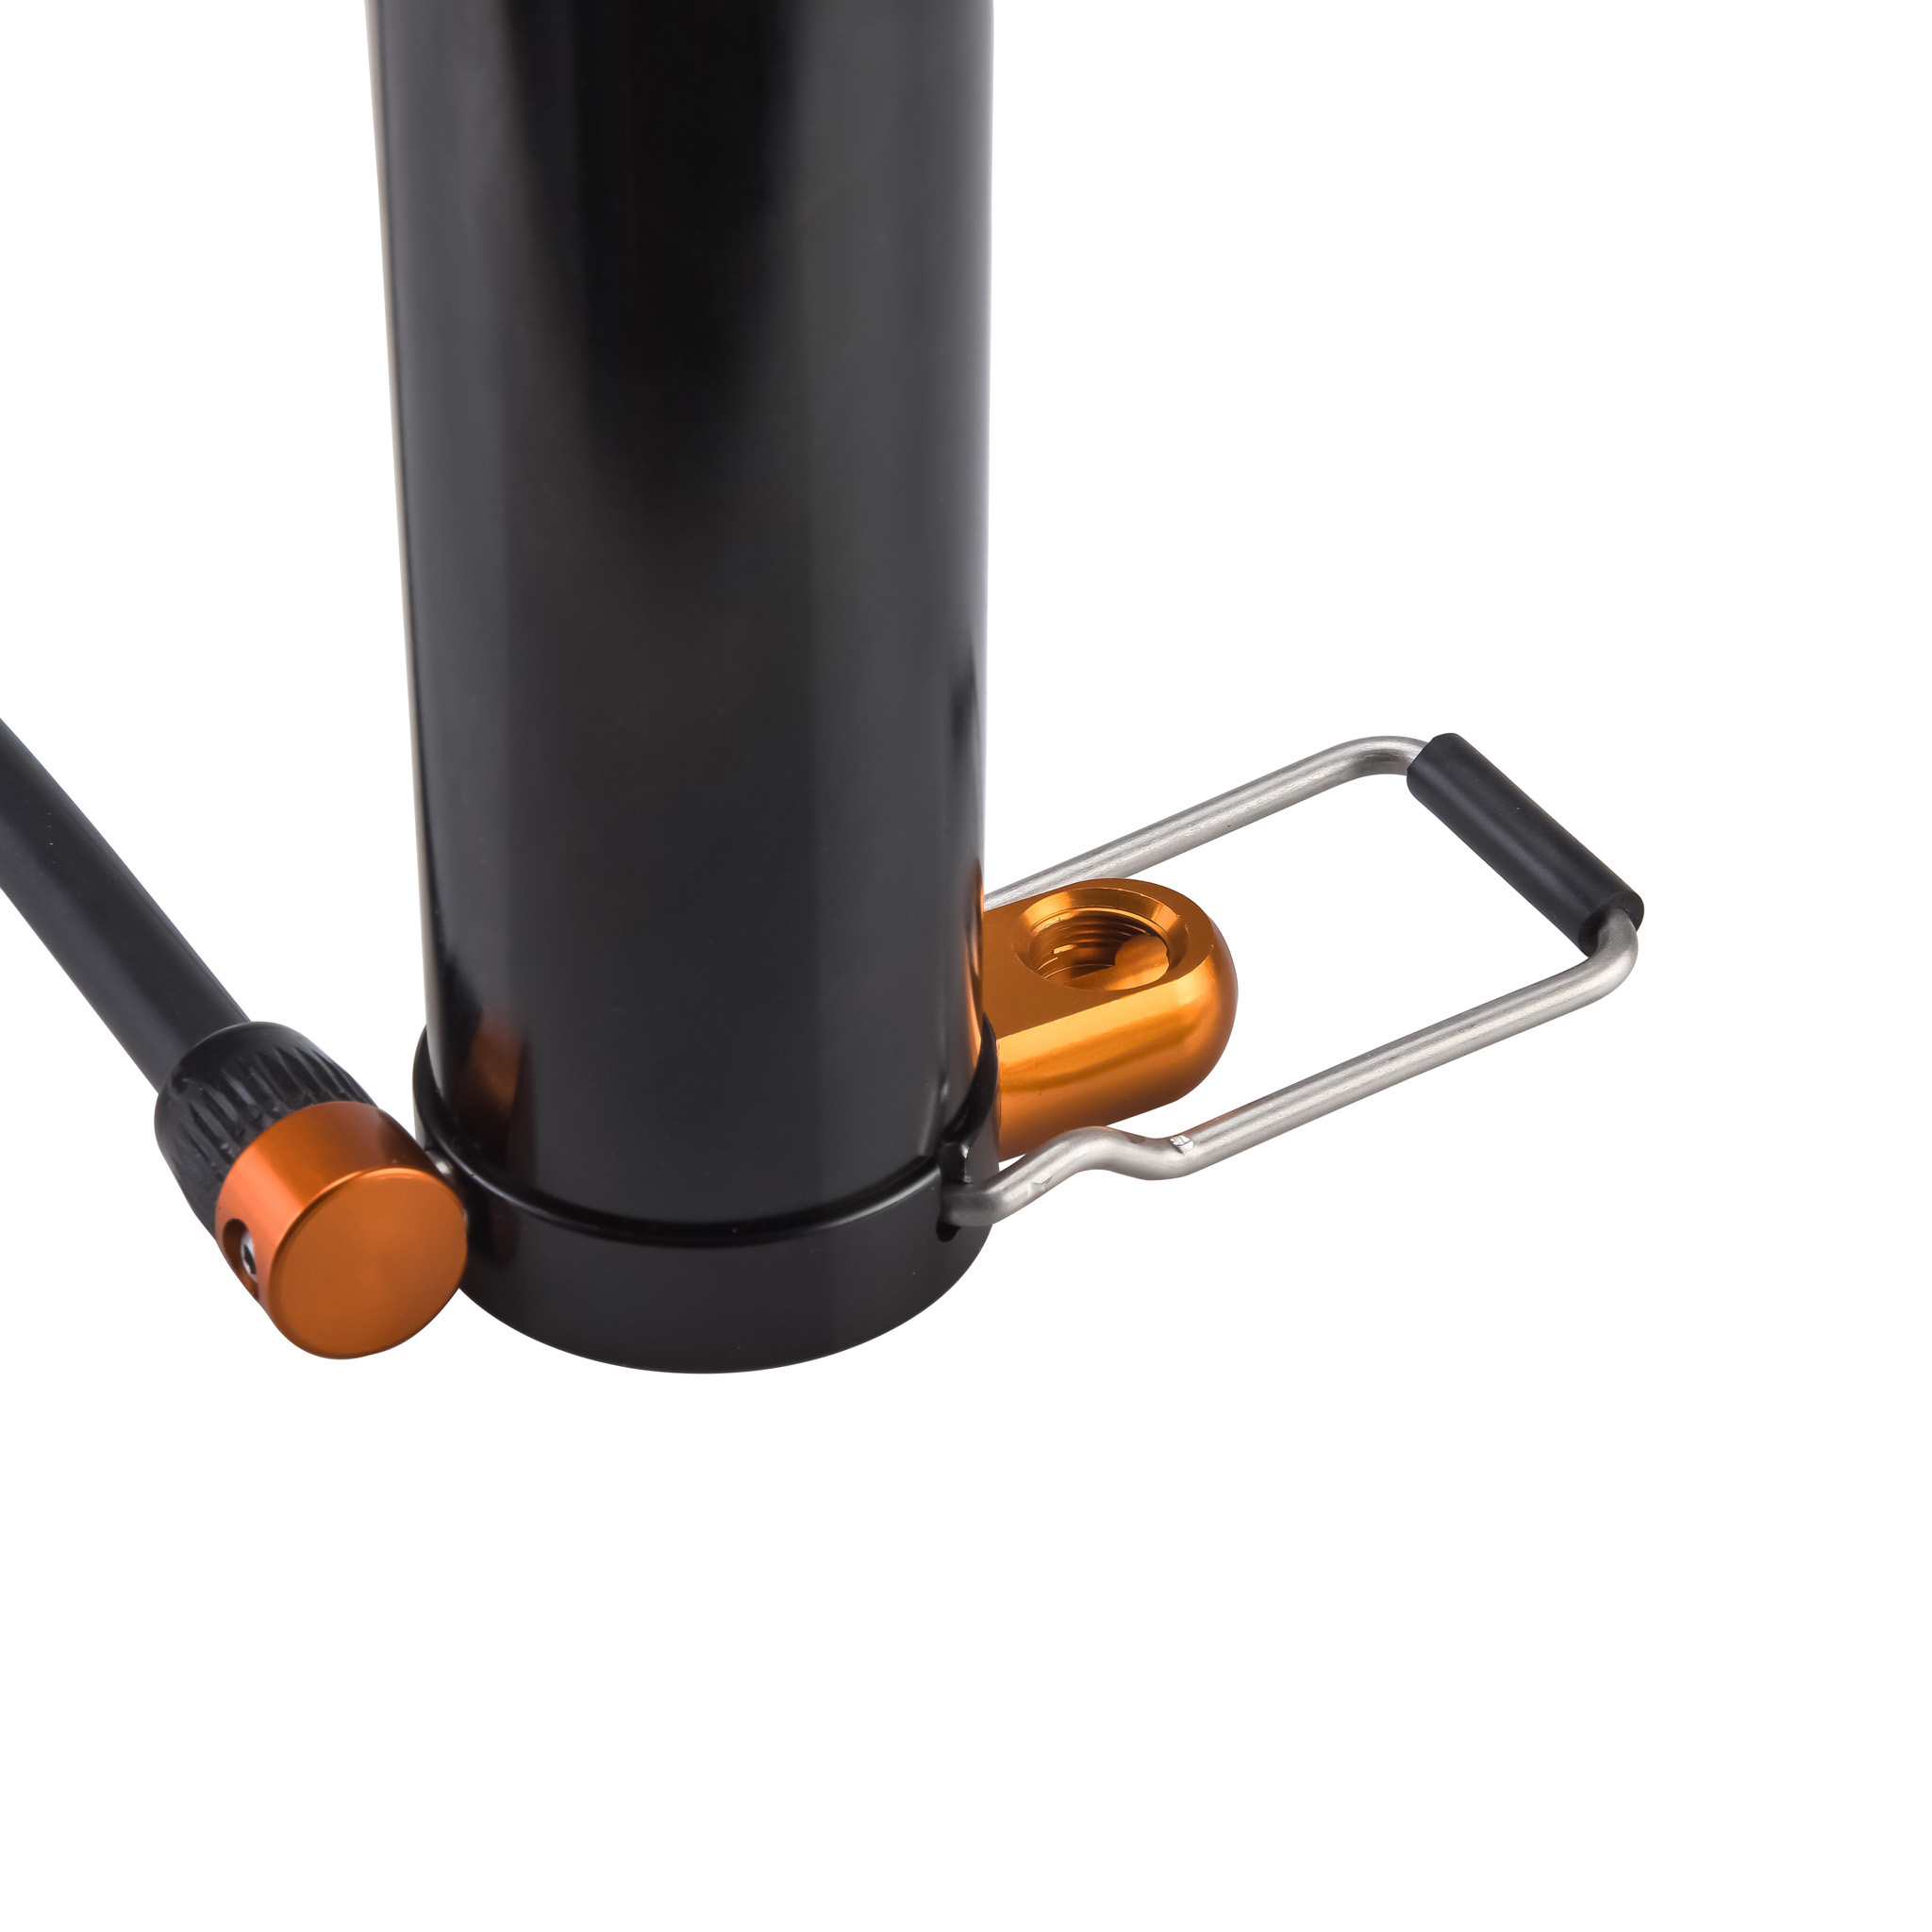 Pompe main lezyne micro floor drive xl probikeshop for Micro floor